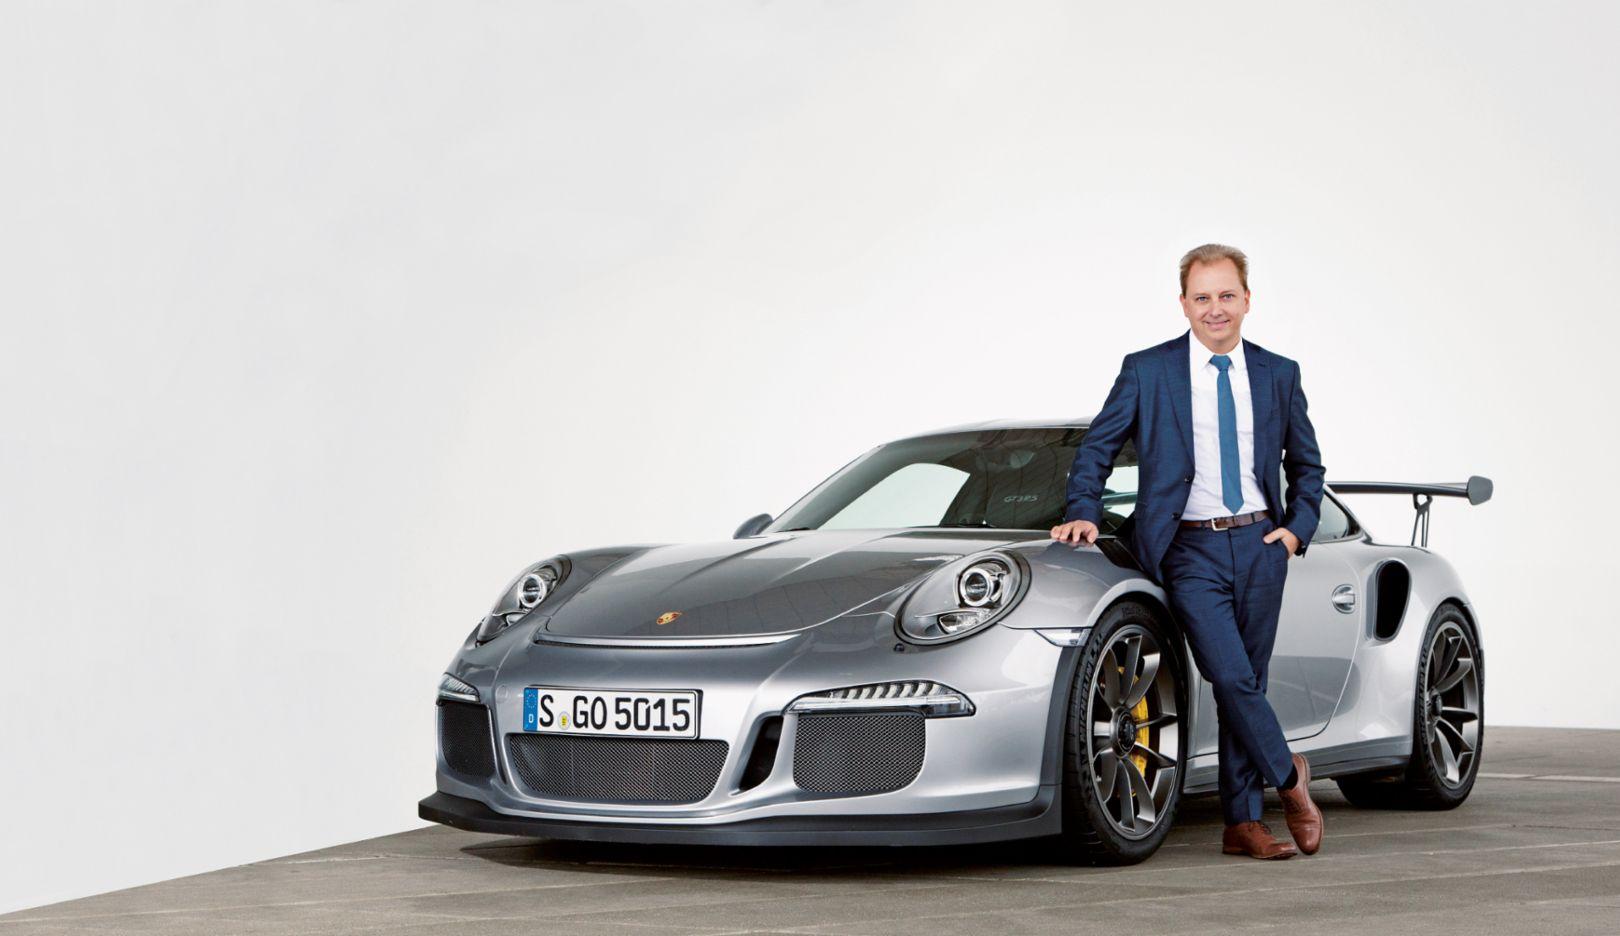 Thilo Koslowski, Porsche 911 GT3 RS, 2016, Porsche AG